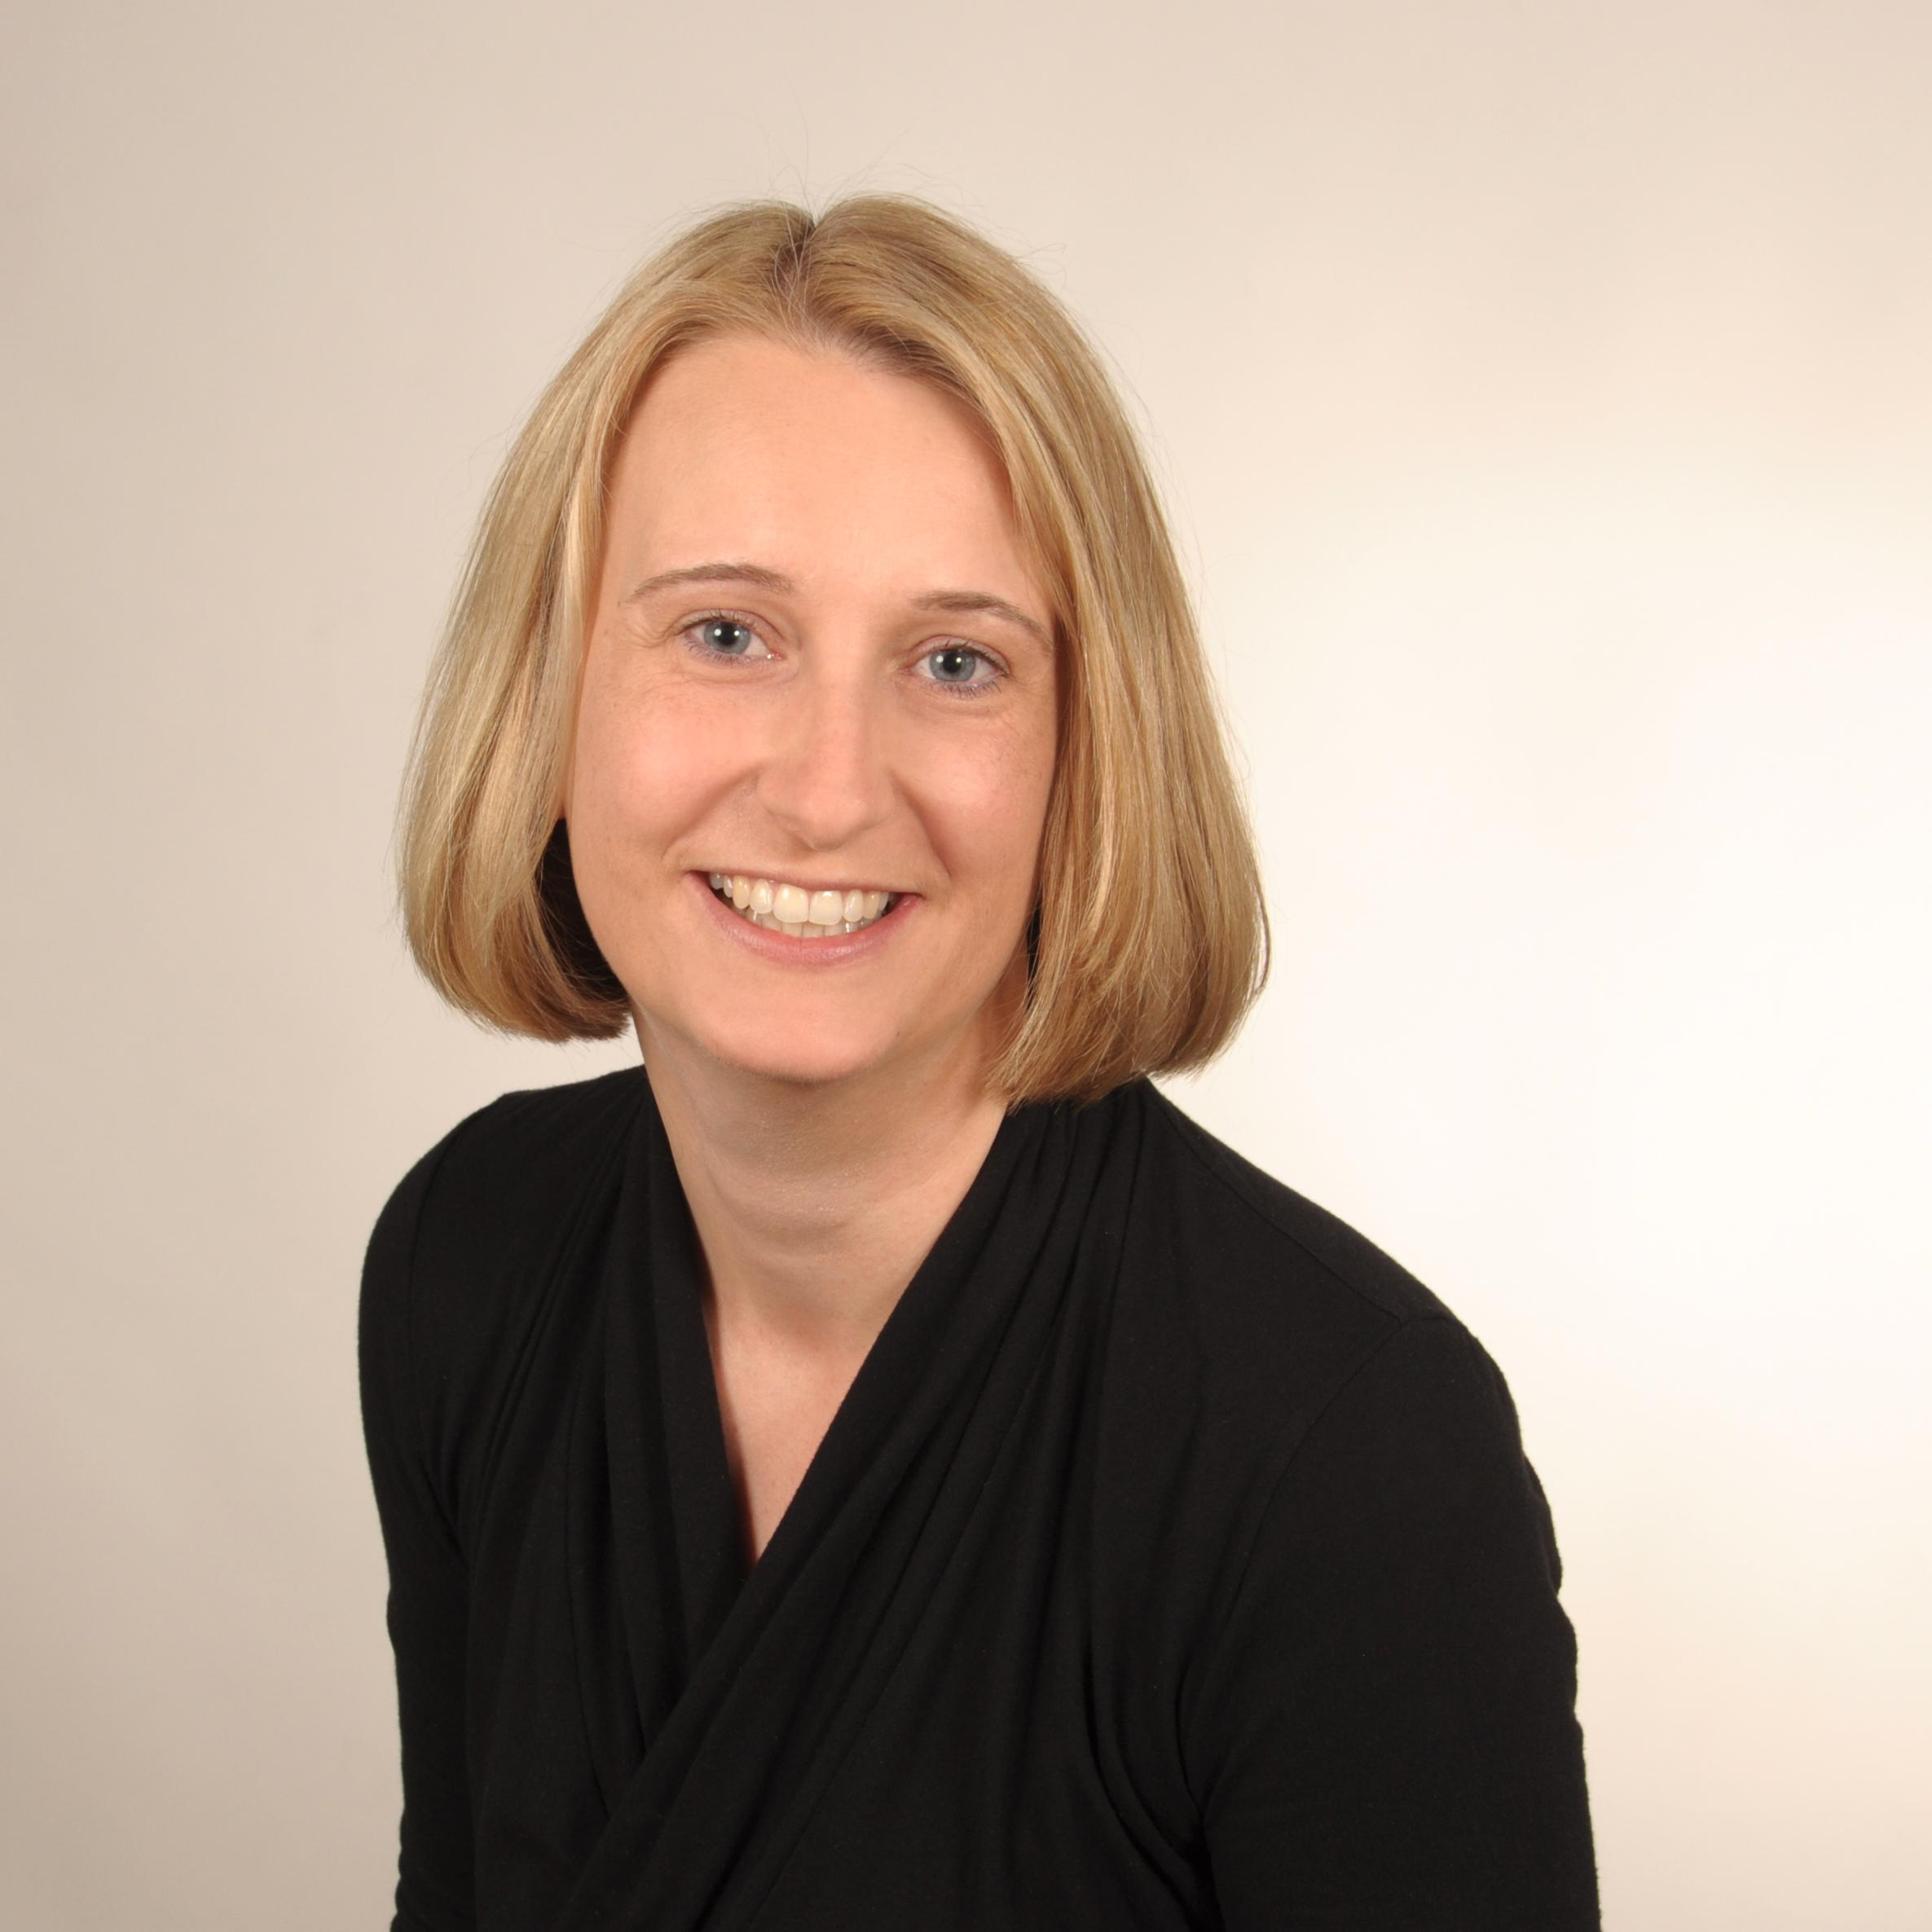 Kristin Harms